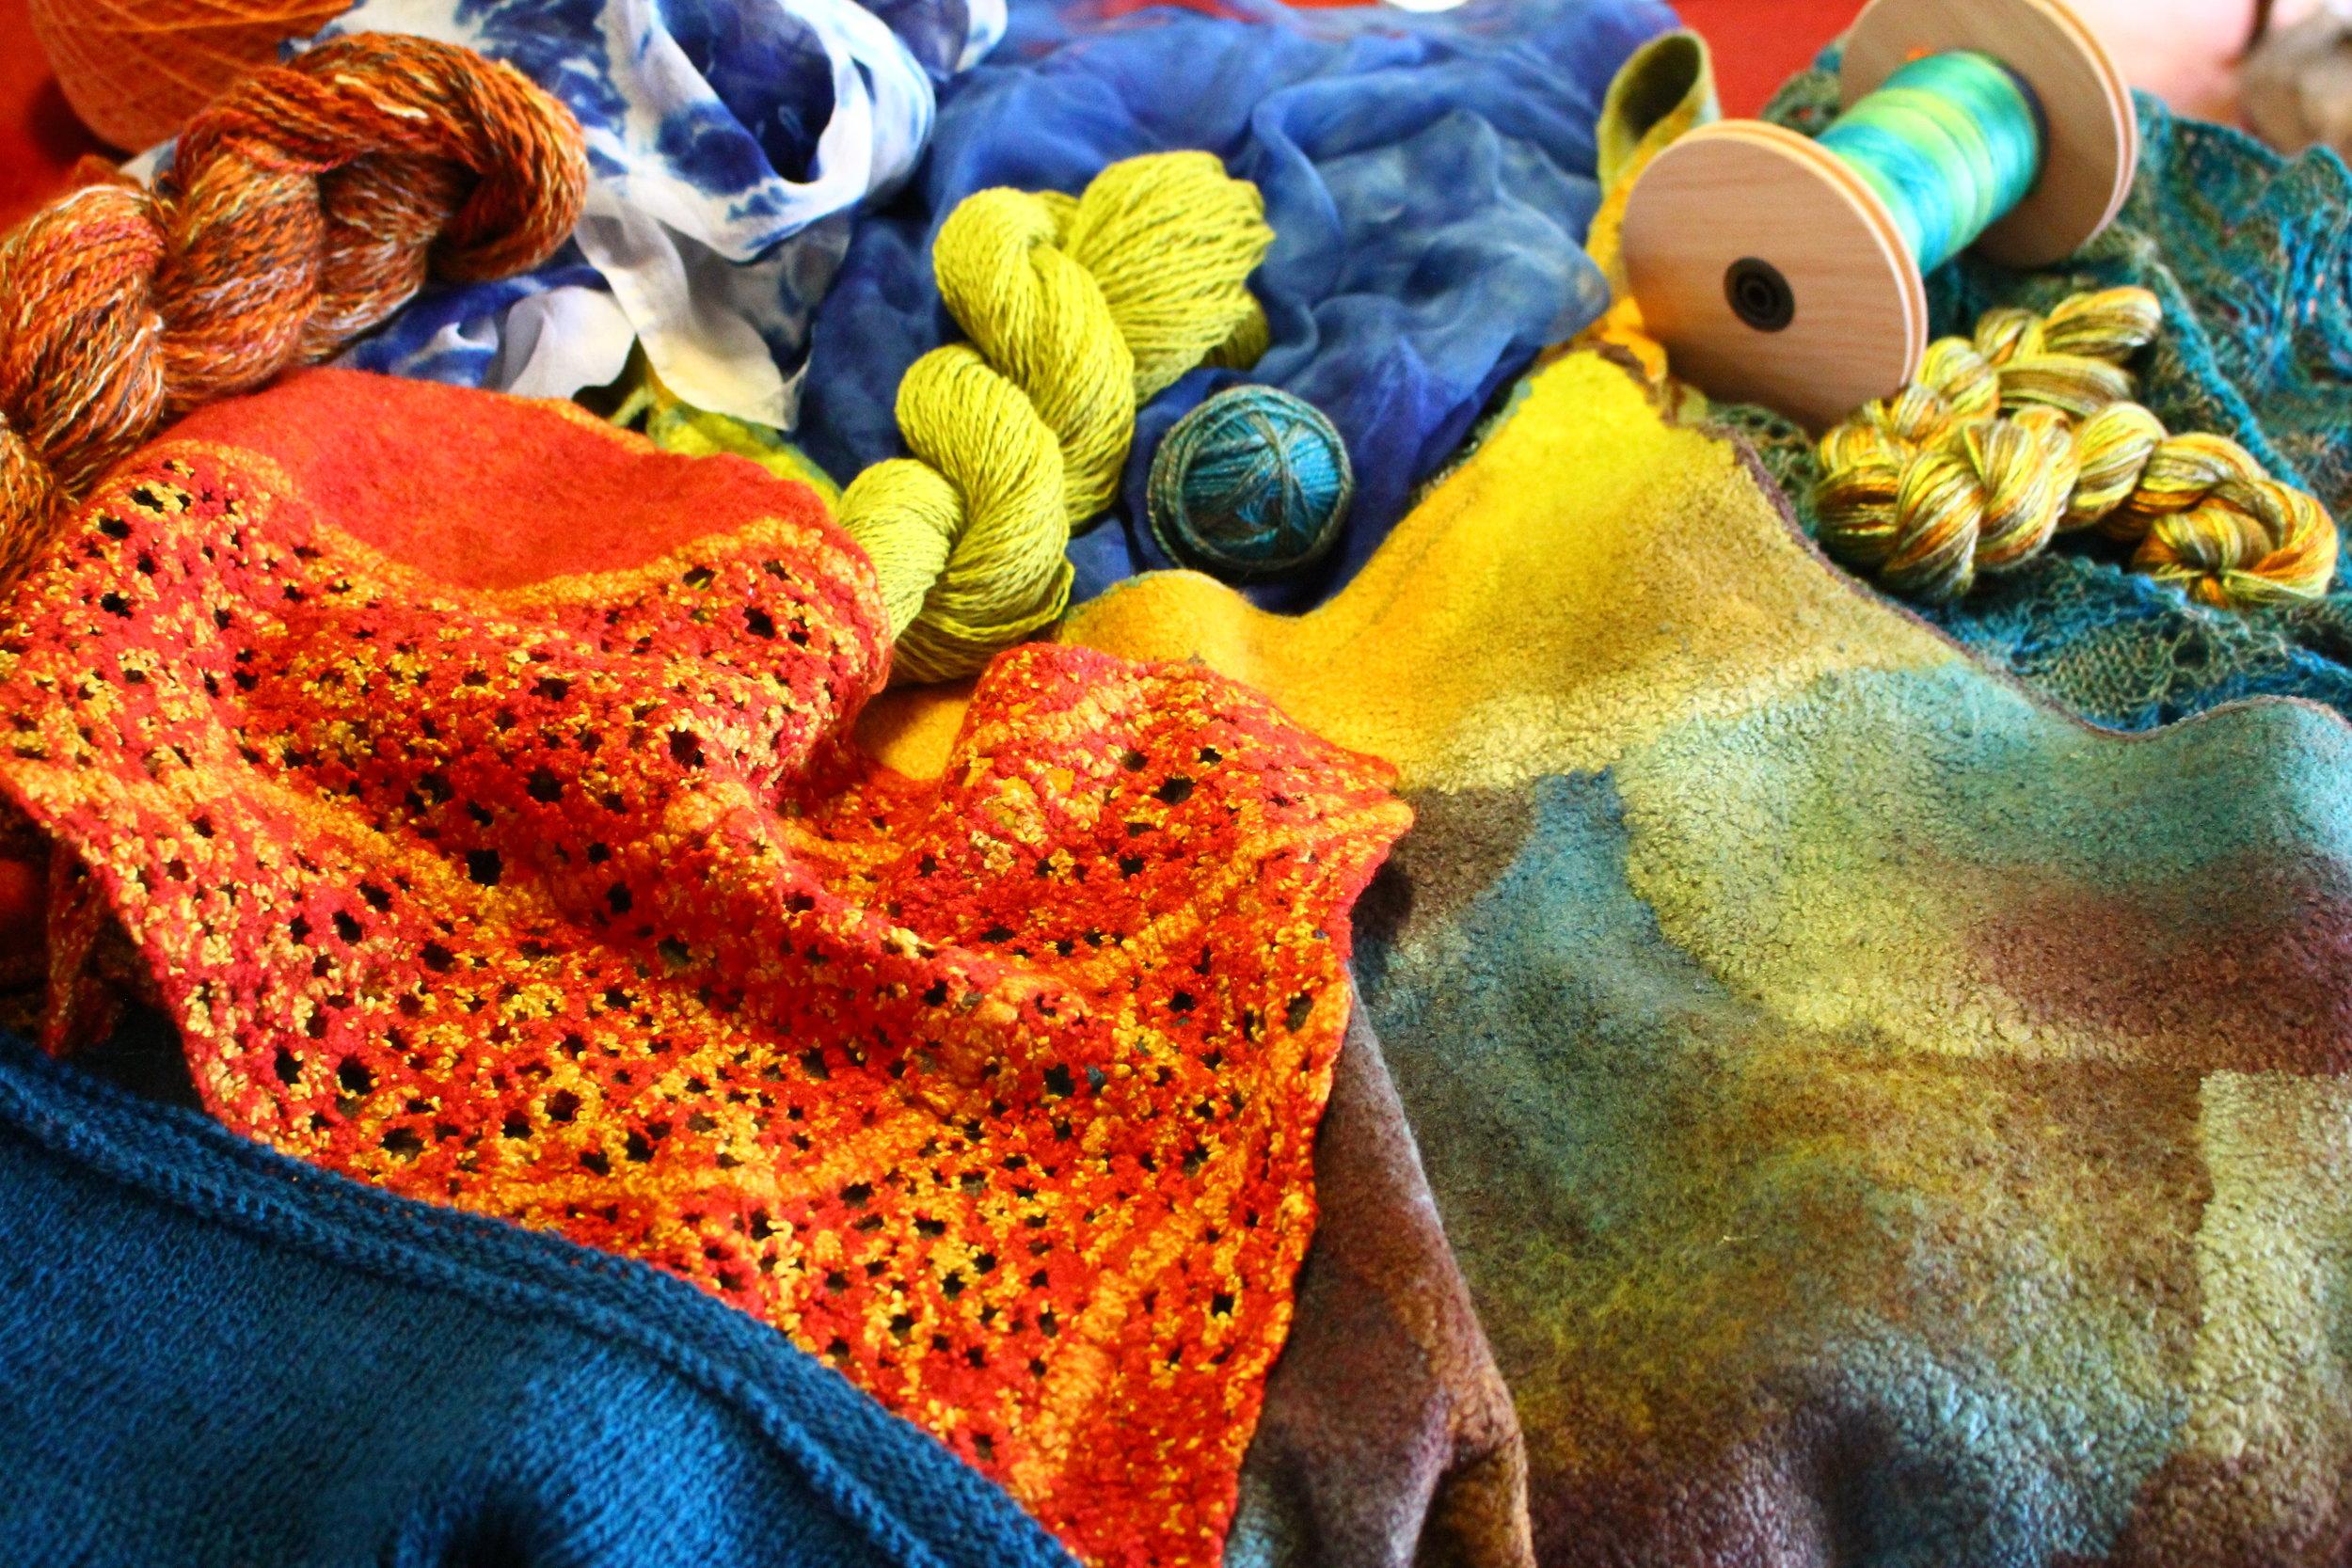 Lee Nash Various items 2017-18 Silks felted,spun, woven, dyed.JPG